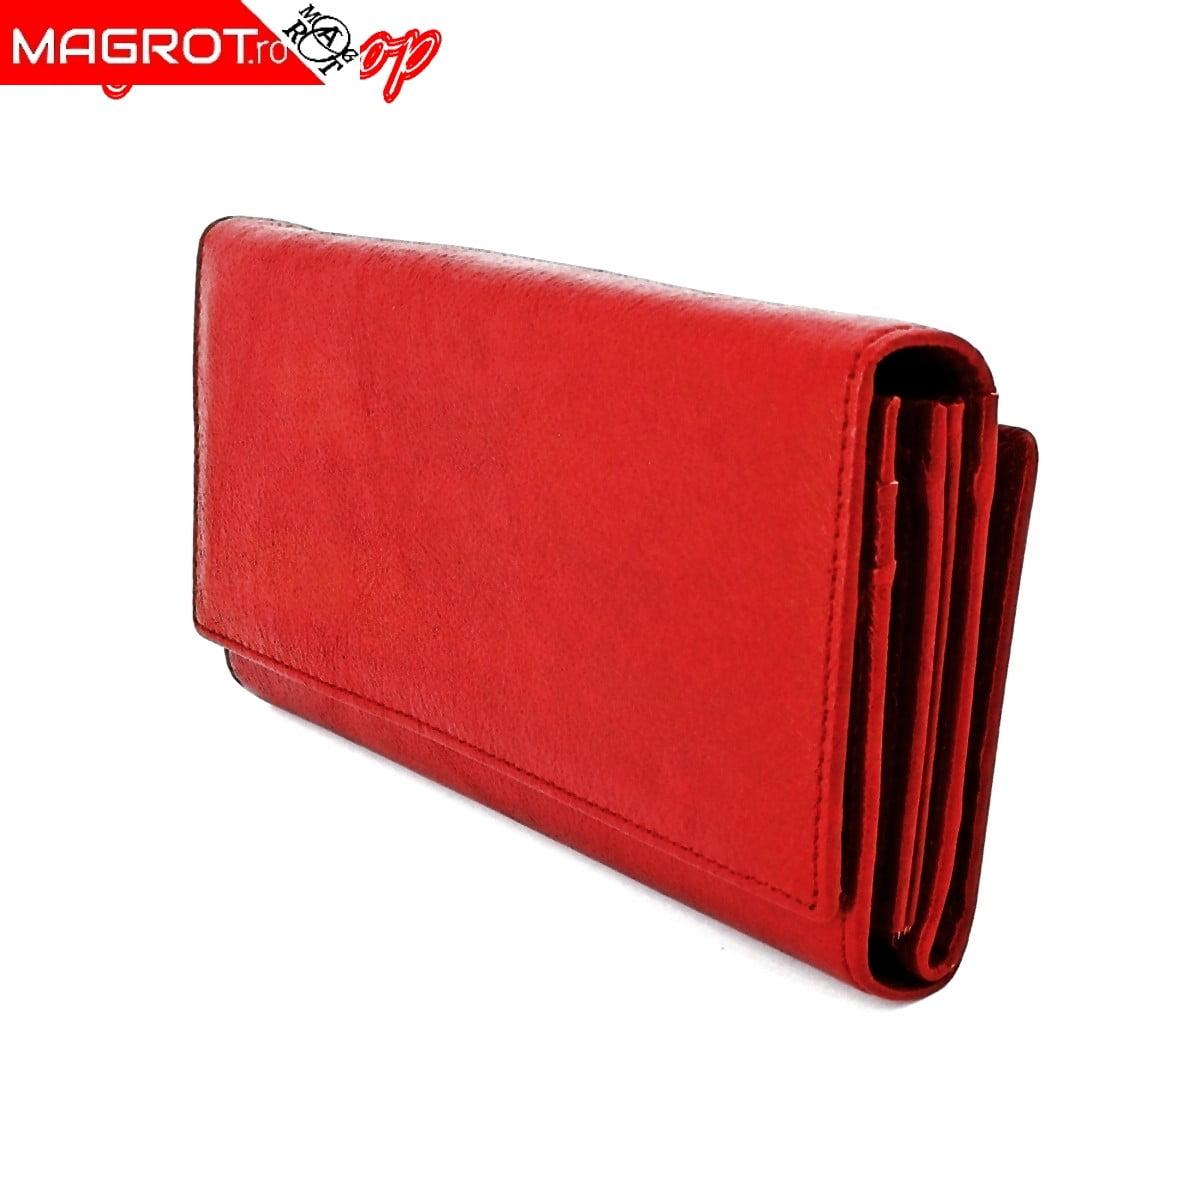 Portofel de dama, red, din pioele naturala 18/10, Magrot A05 Cod produs: 13941